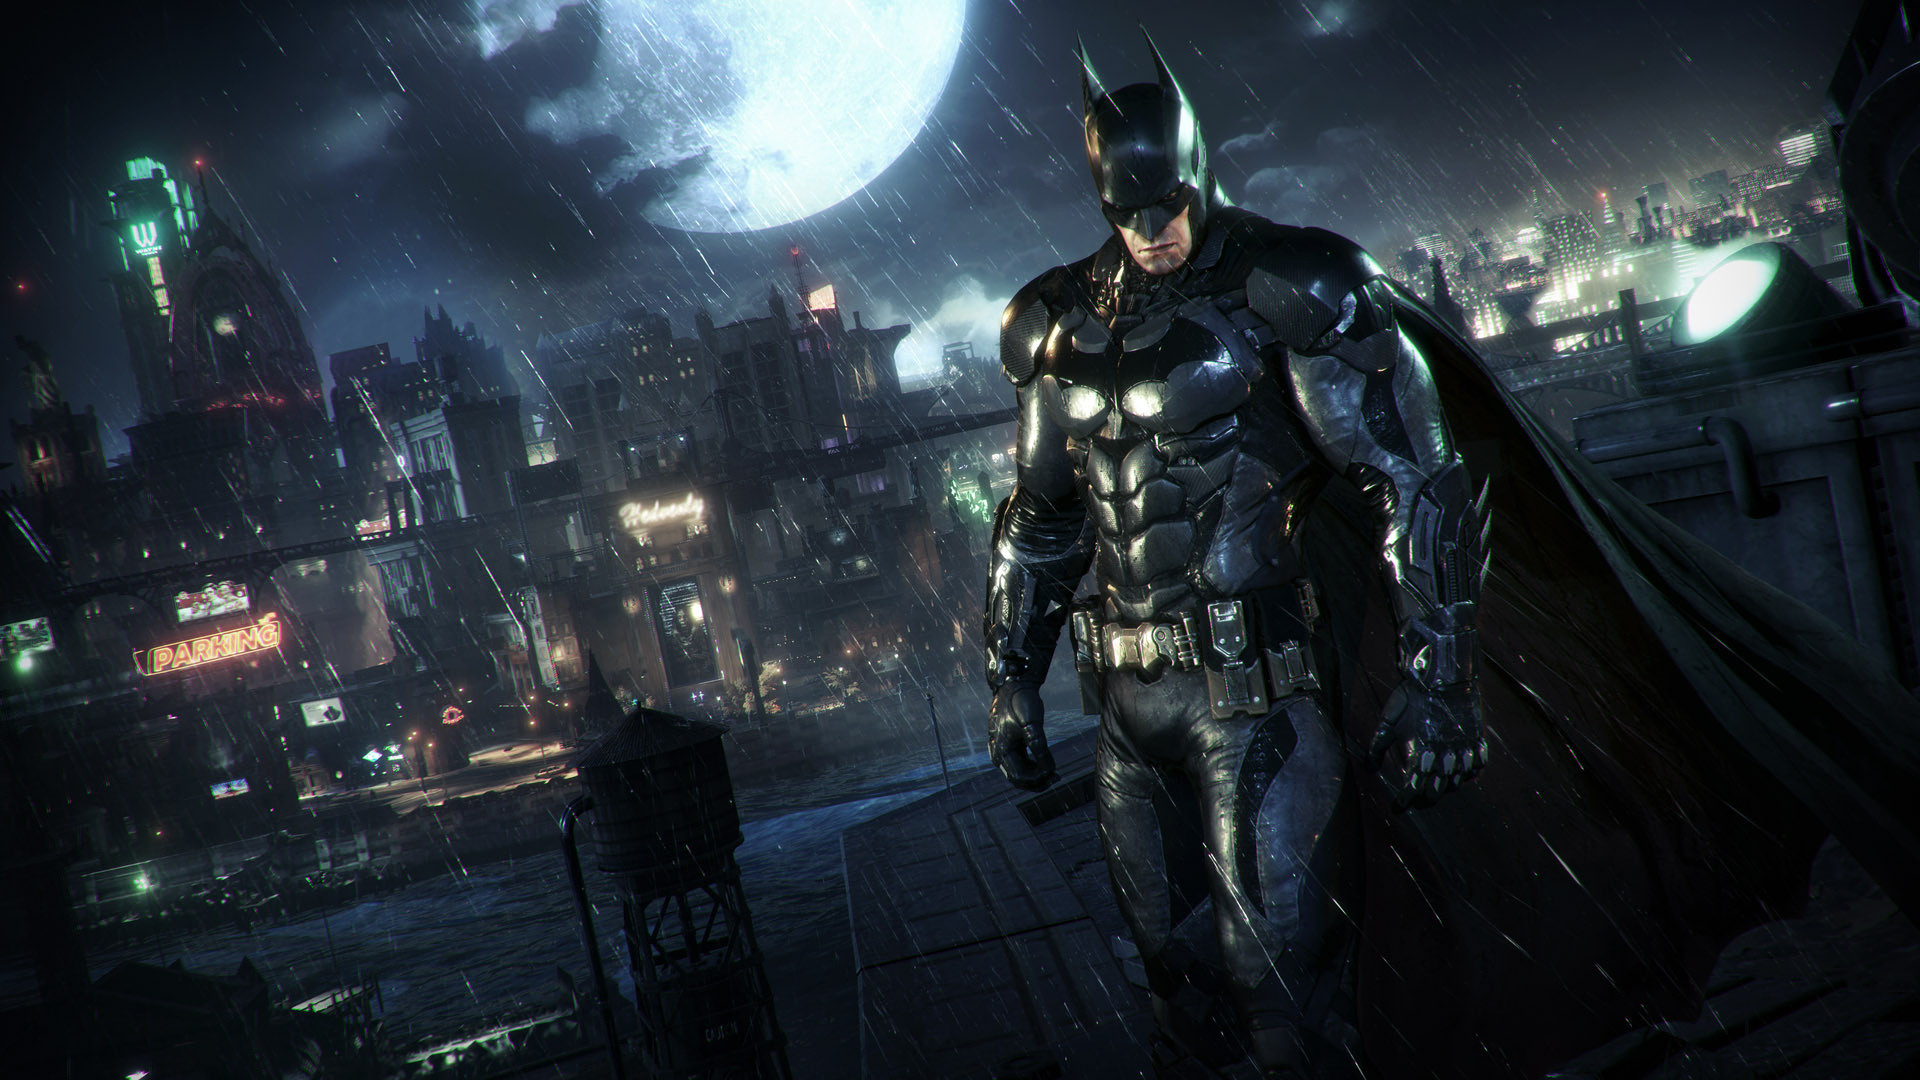 … Batman Wallpapers Phone for Background Wallpaper Beyond Batman The .